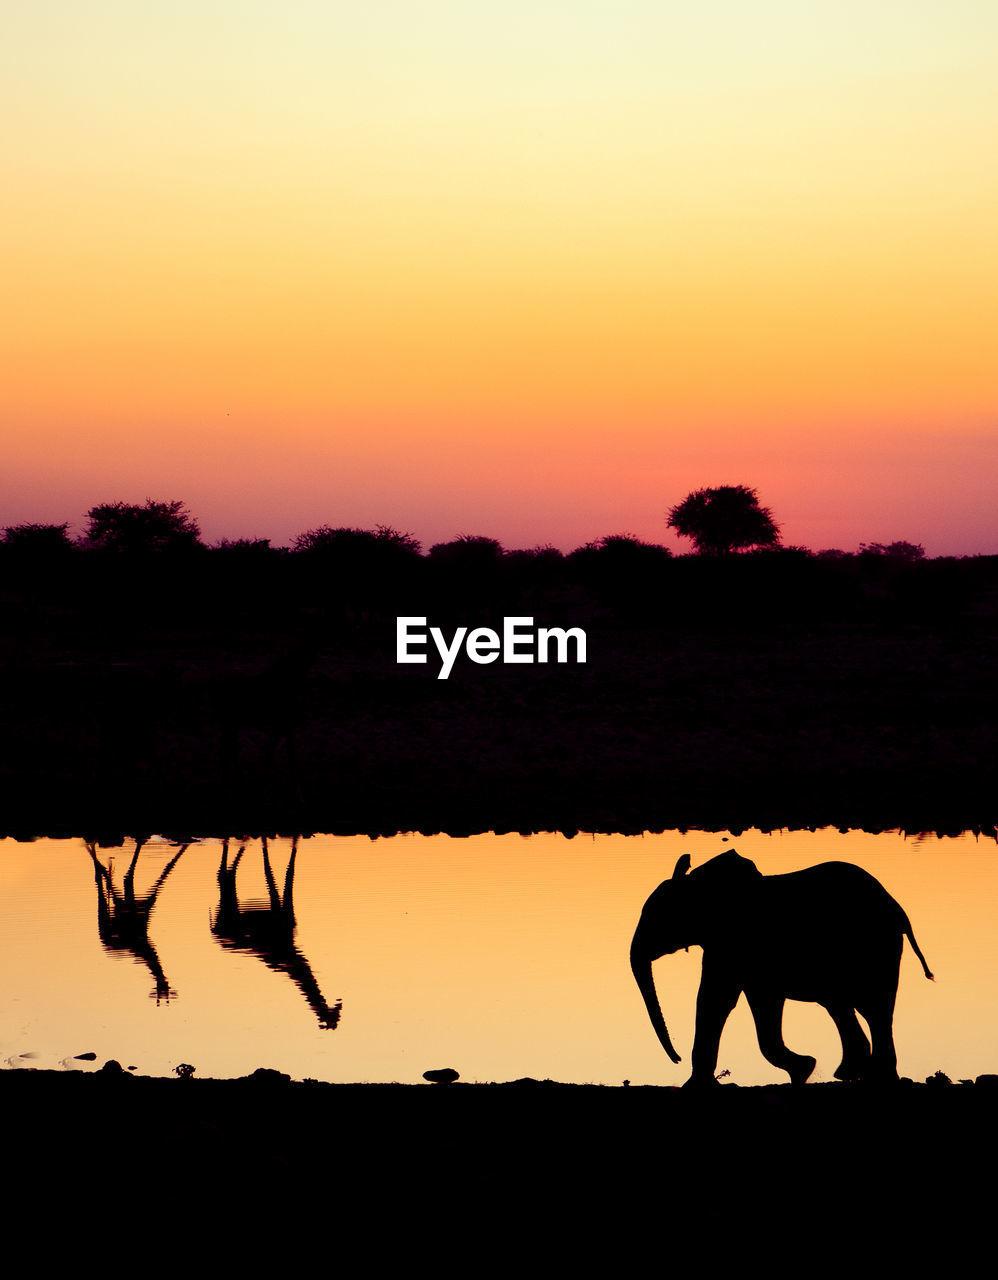 SILHOUETTE ELEPHANT ON LANDSCAPE AGAINST SUNSET SKY